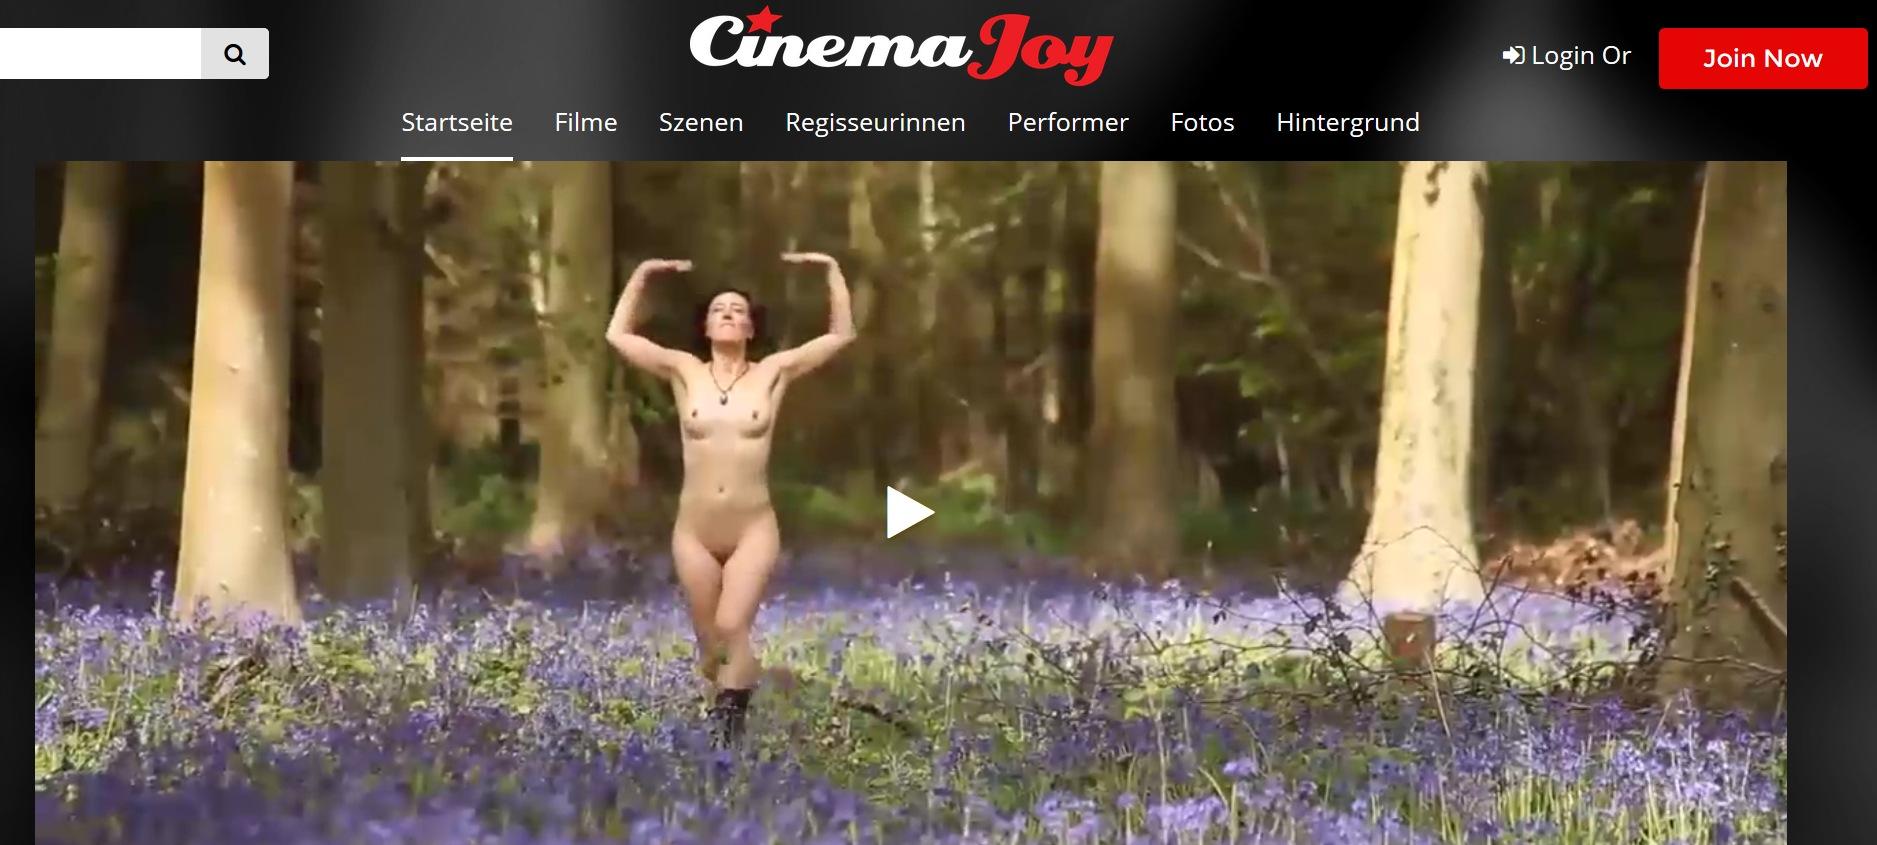 cinemajoy